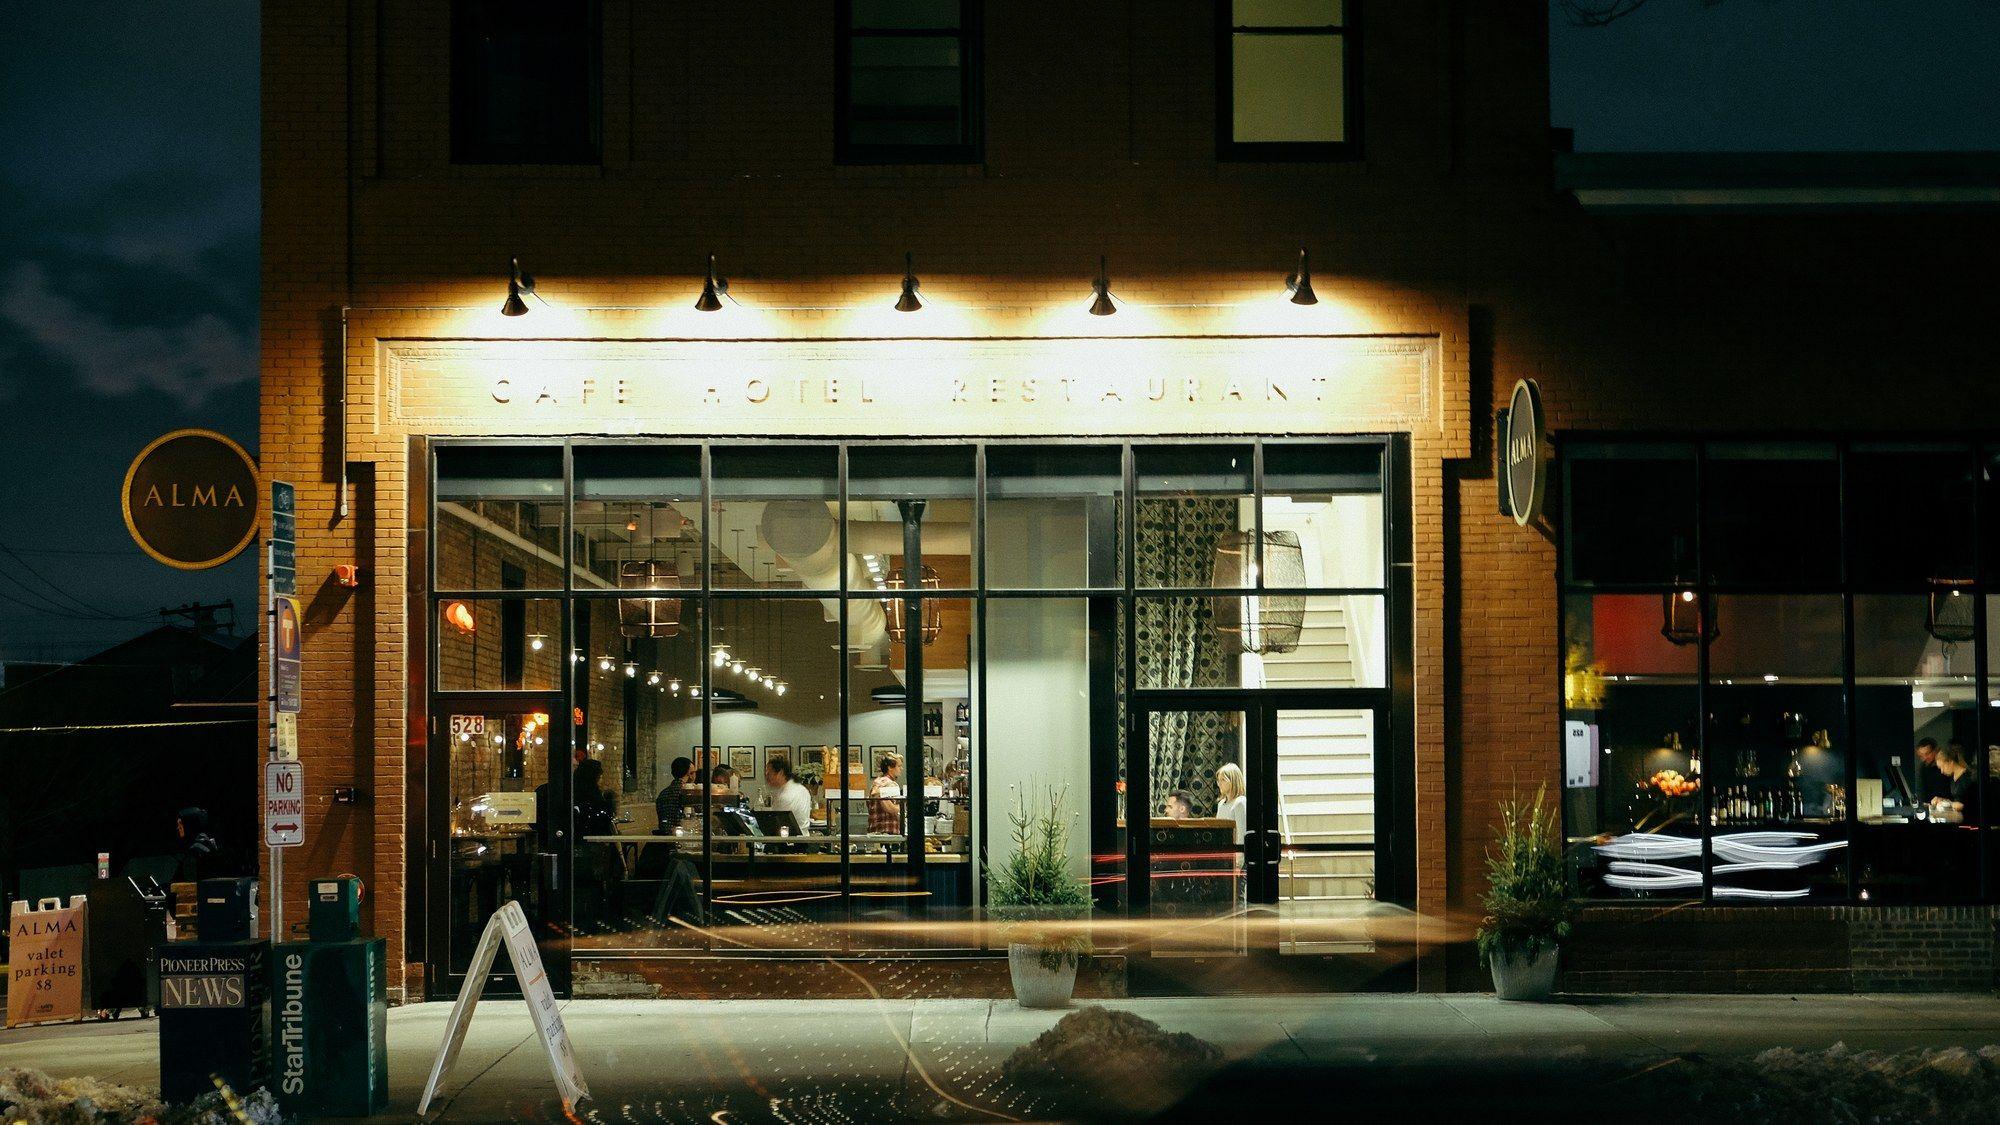 Alma Review Minneapolis Restaurants Best Places To Eat Minneapolis Hotels